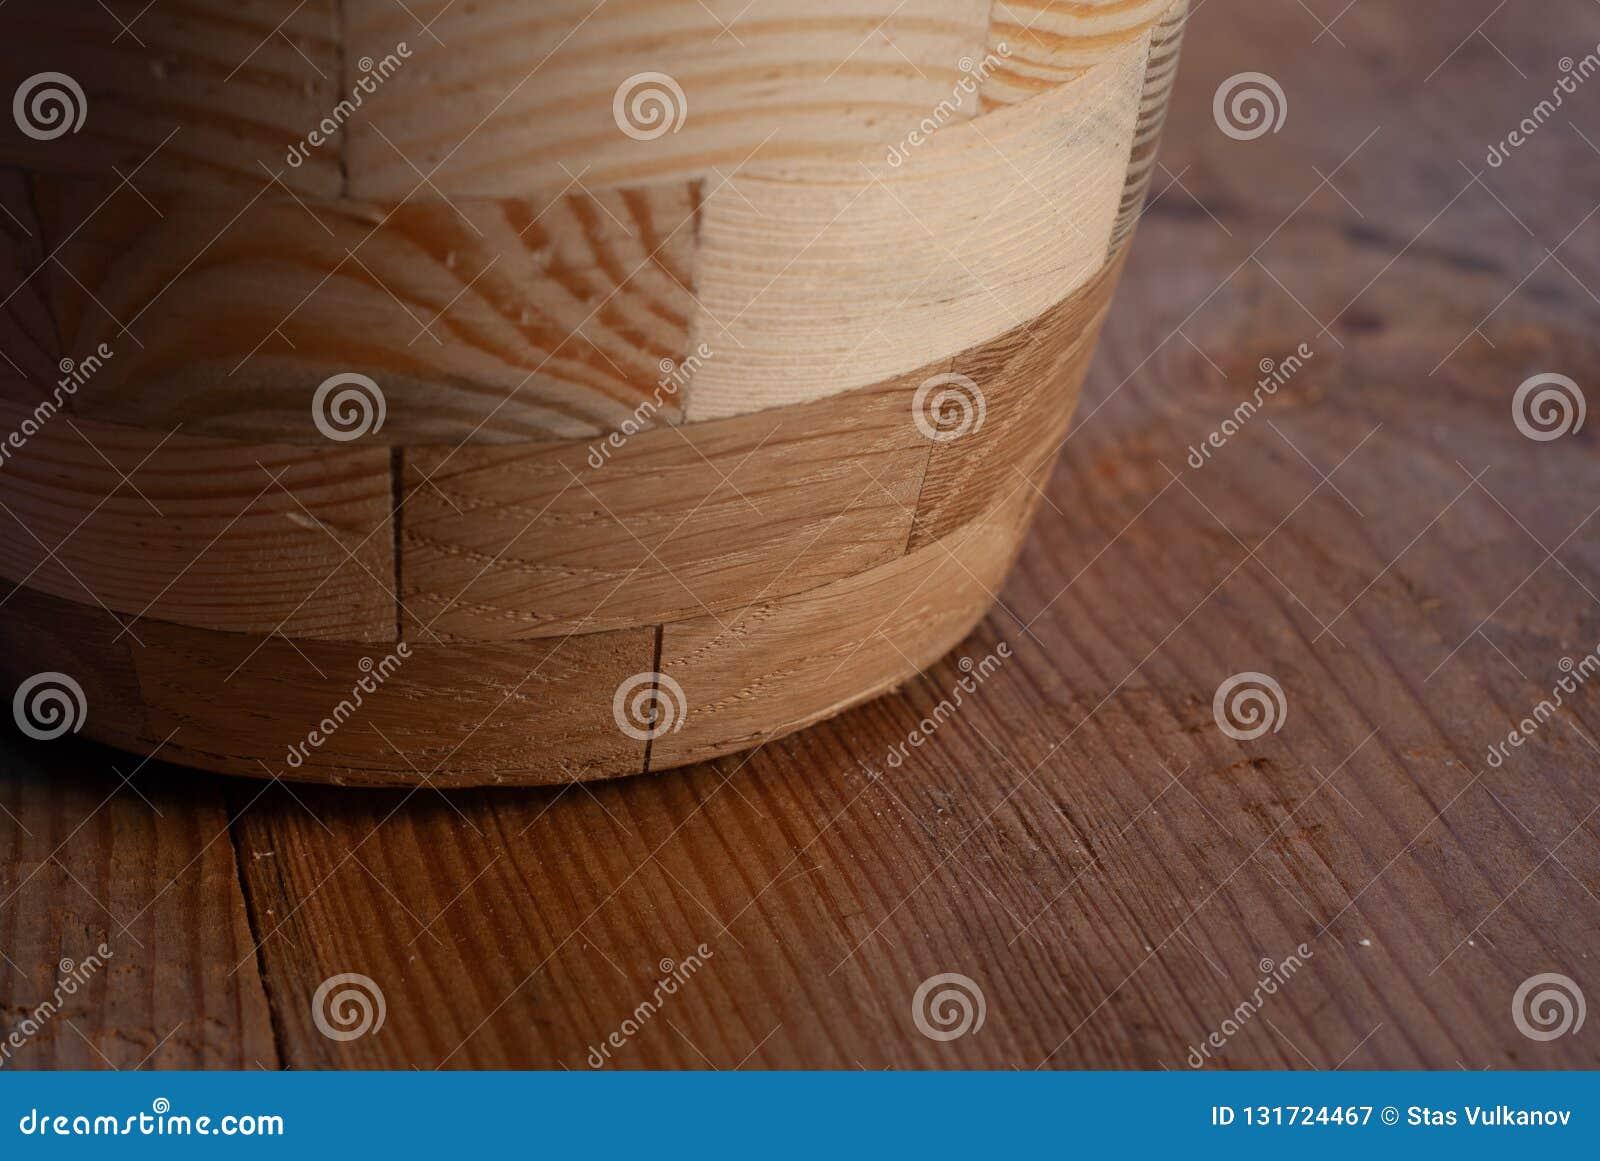 Vajilla de madera, primer de madera del modelo del fondo de la textura del tablero,